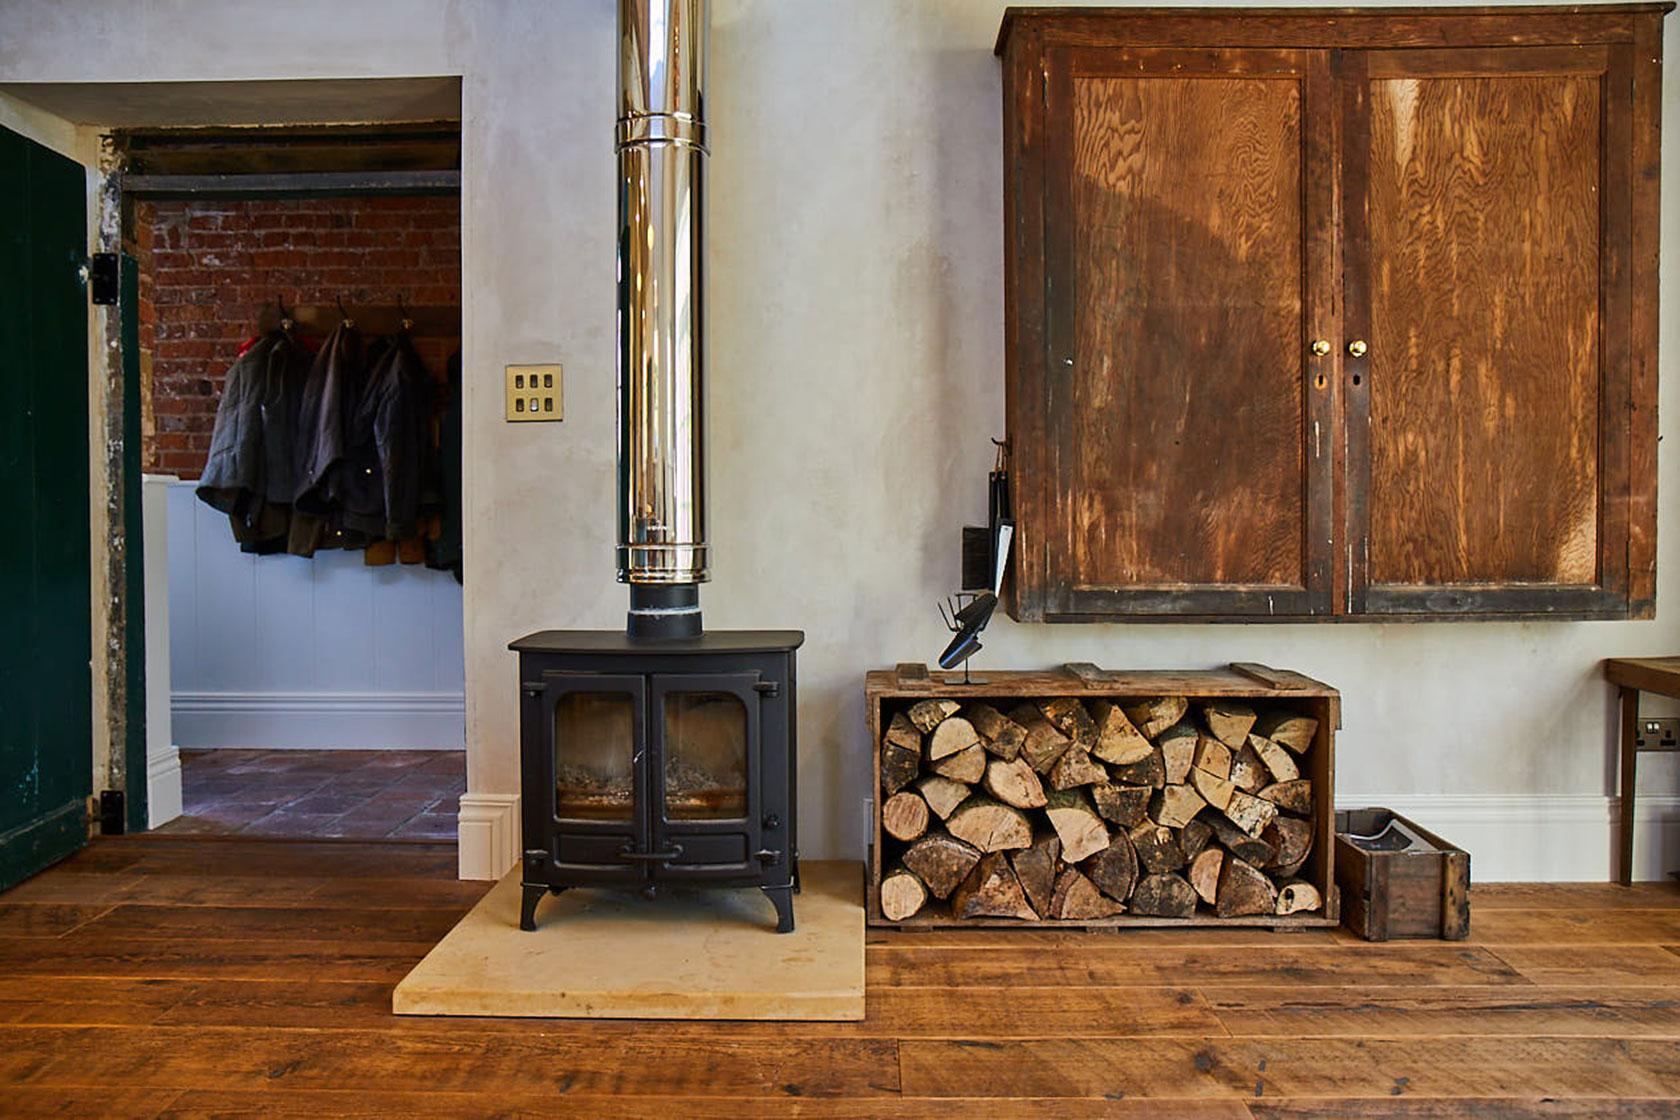 Rustic log burner sits on reclaimed floorboards with logs in log basket